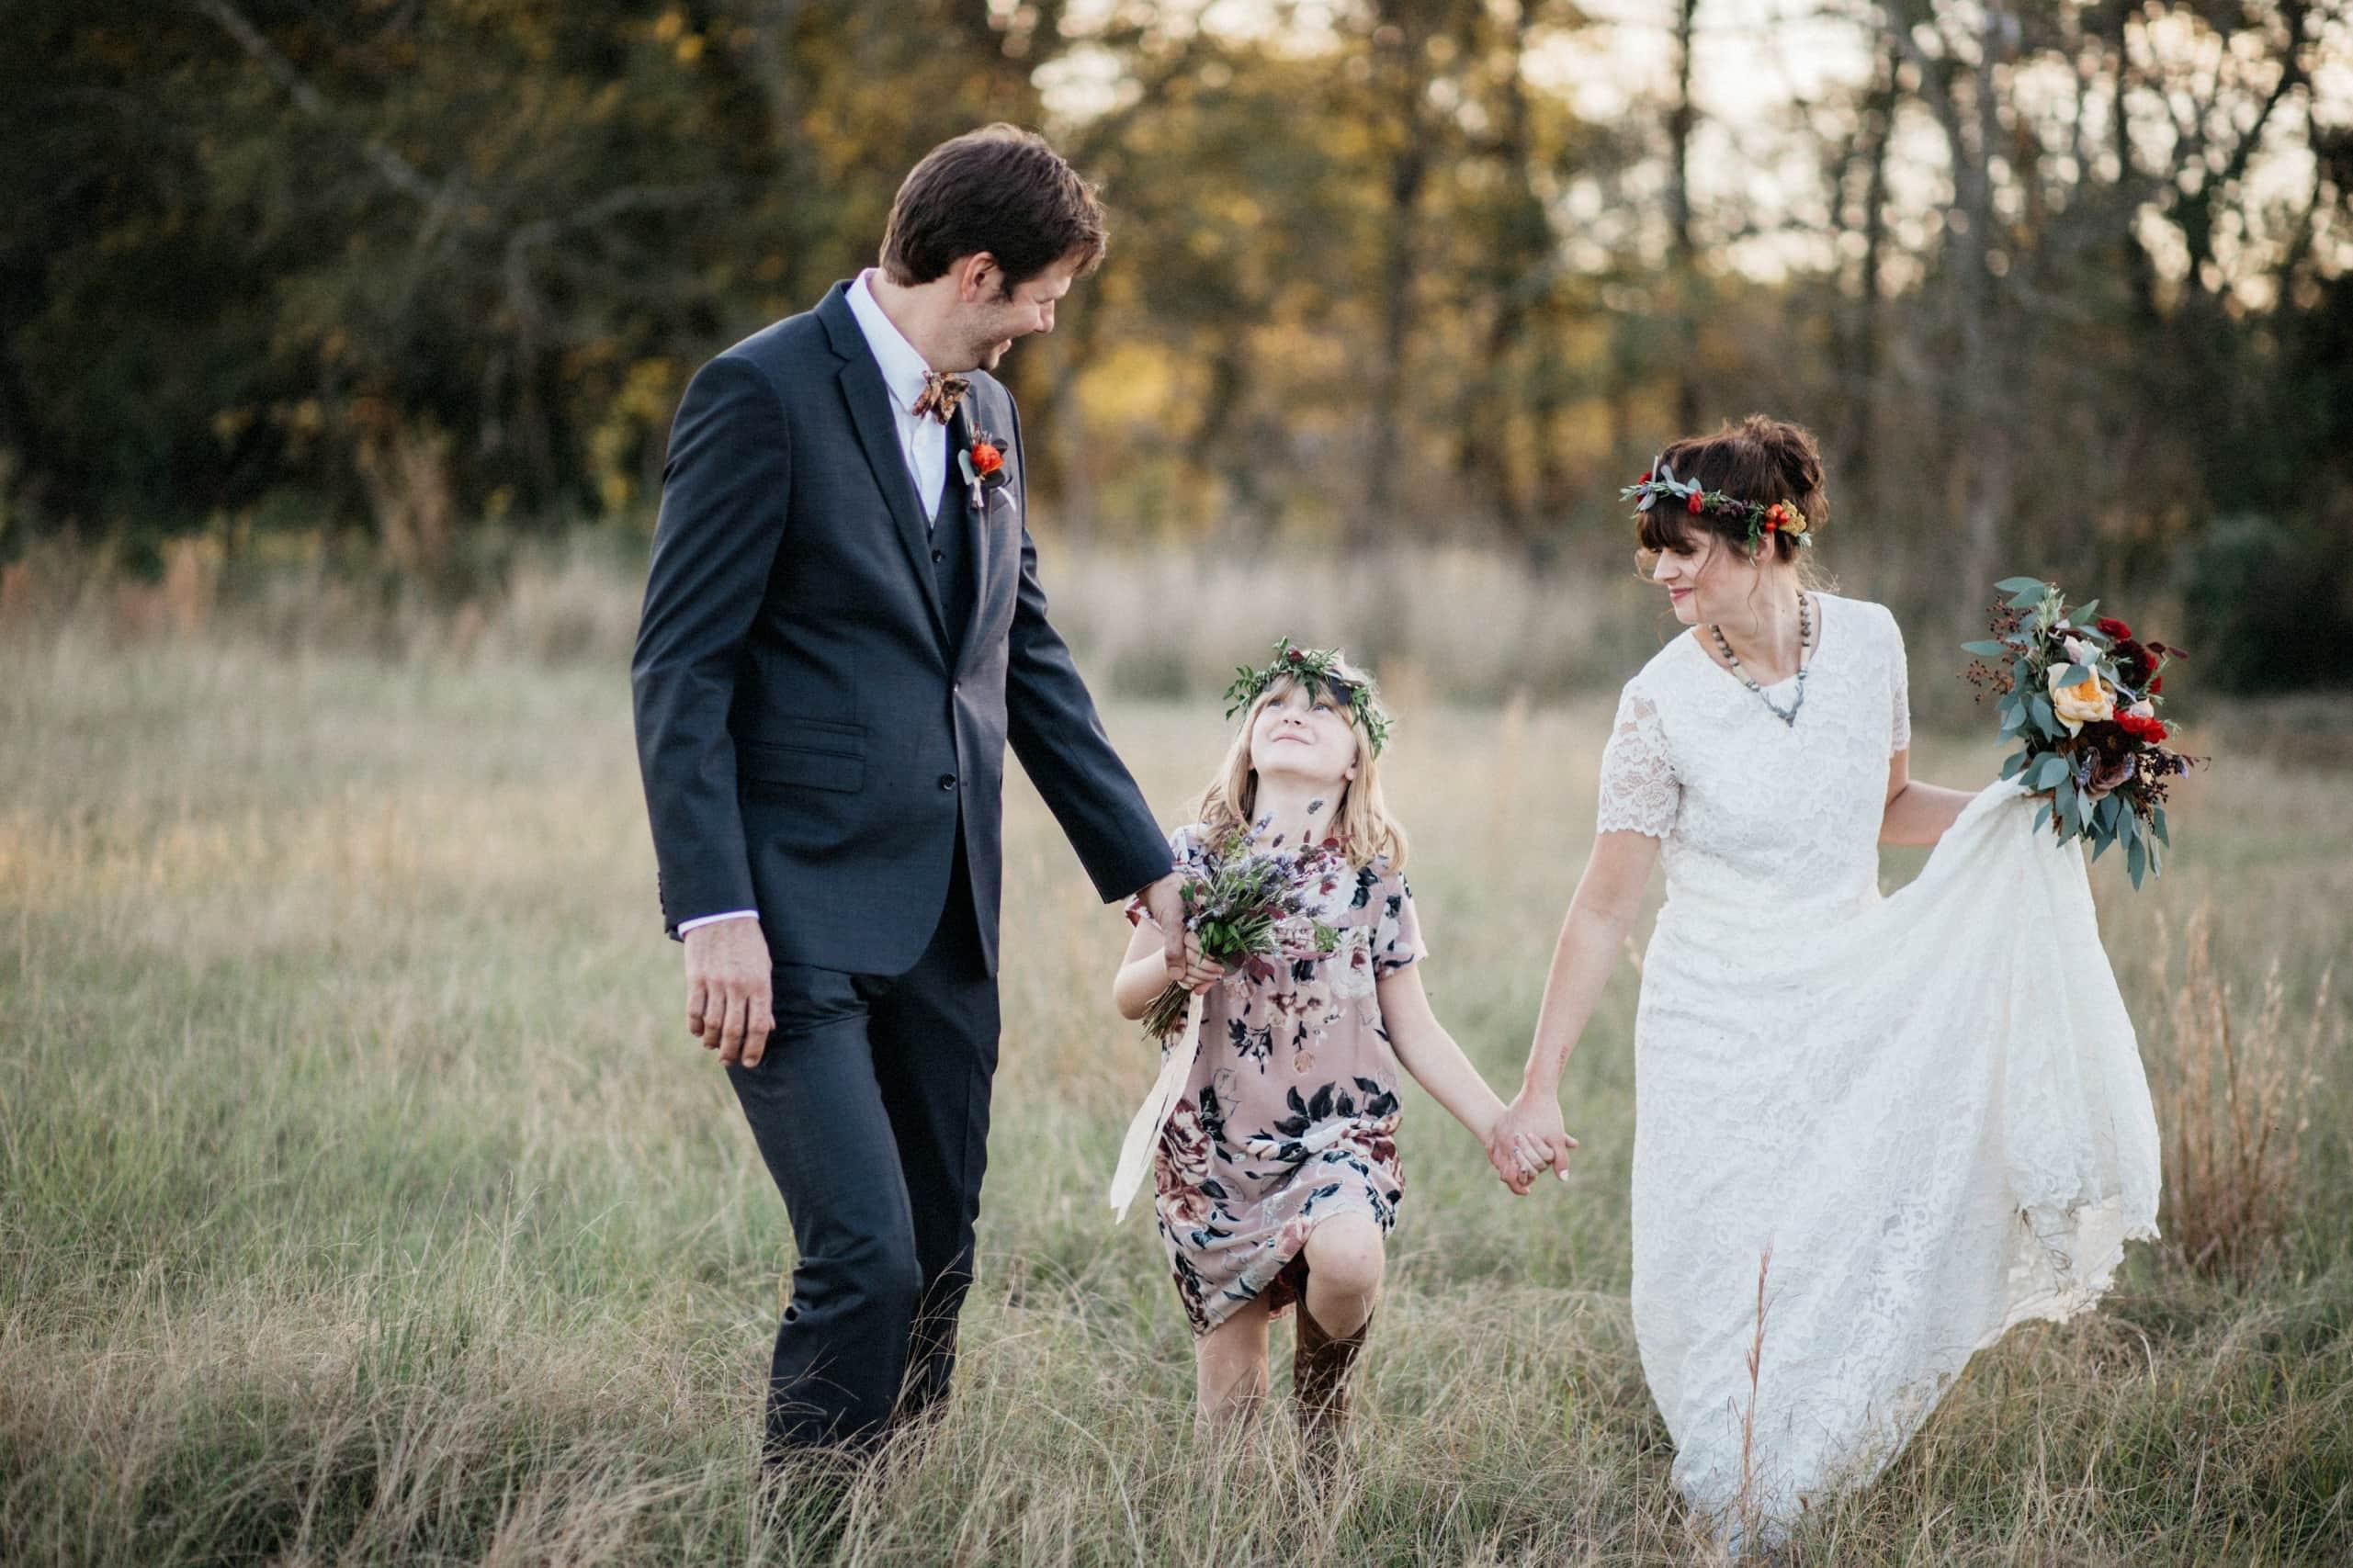 Southern_Surprise_Wedding_0110